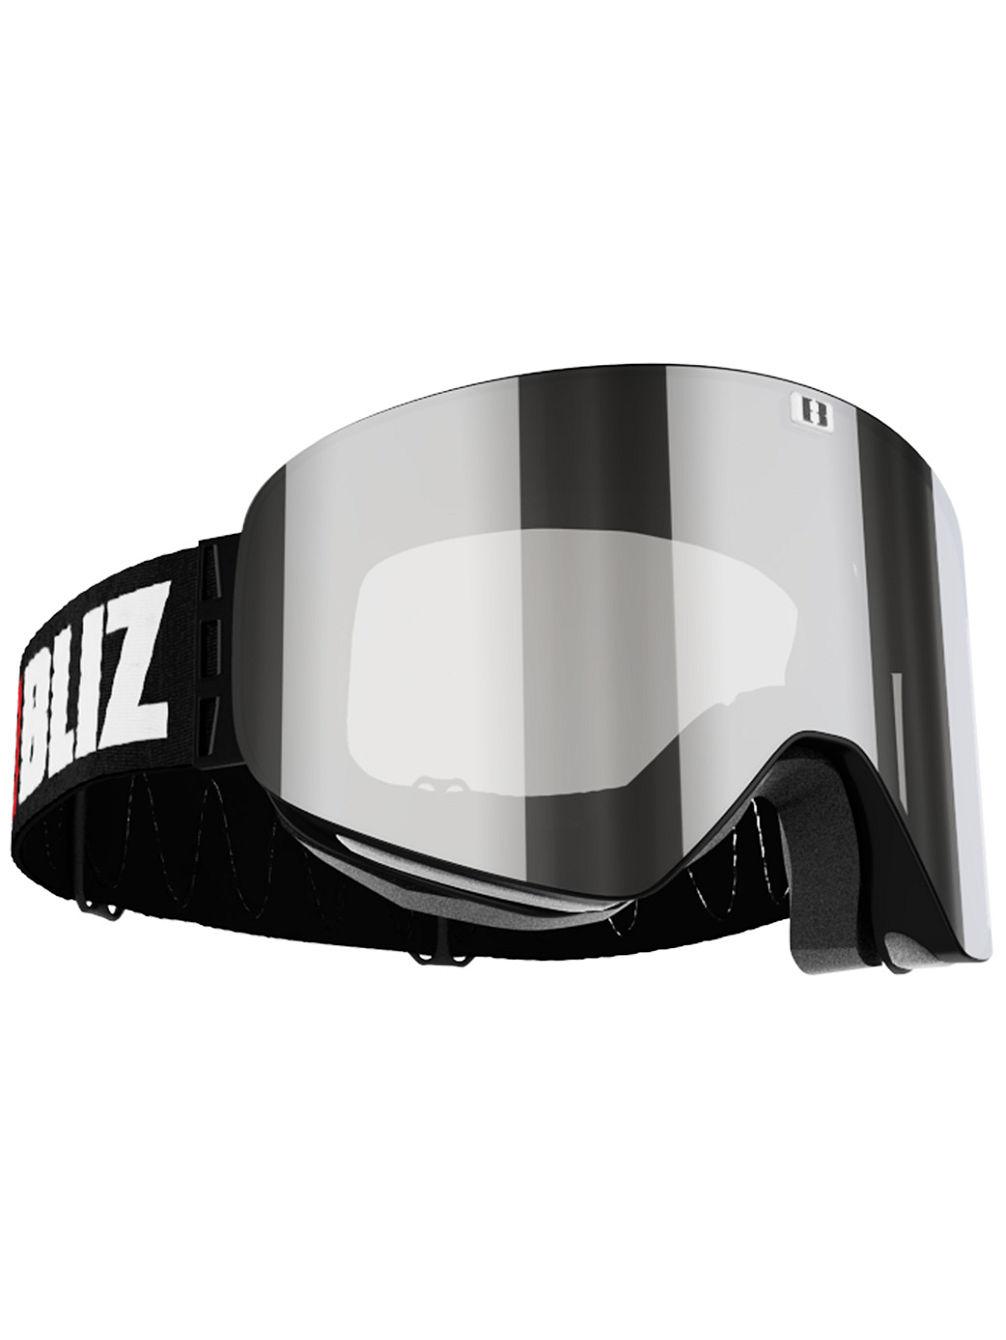 bliz-protective-sports-gear-flow-black-white